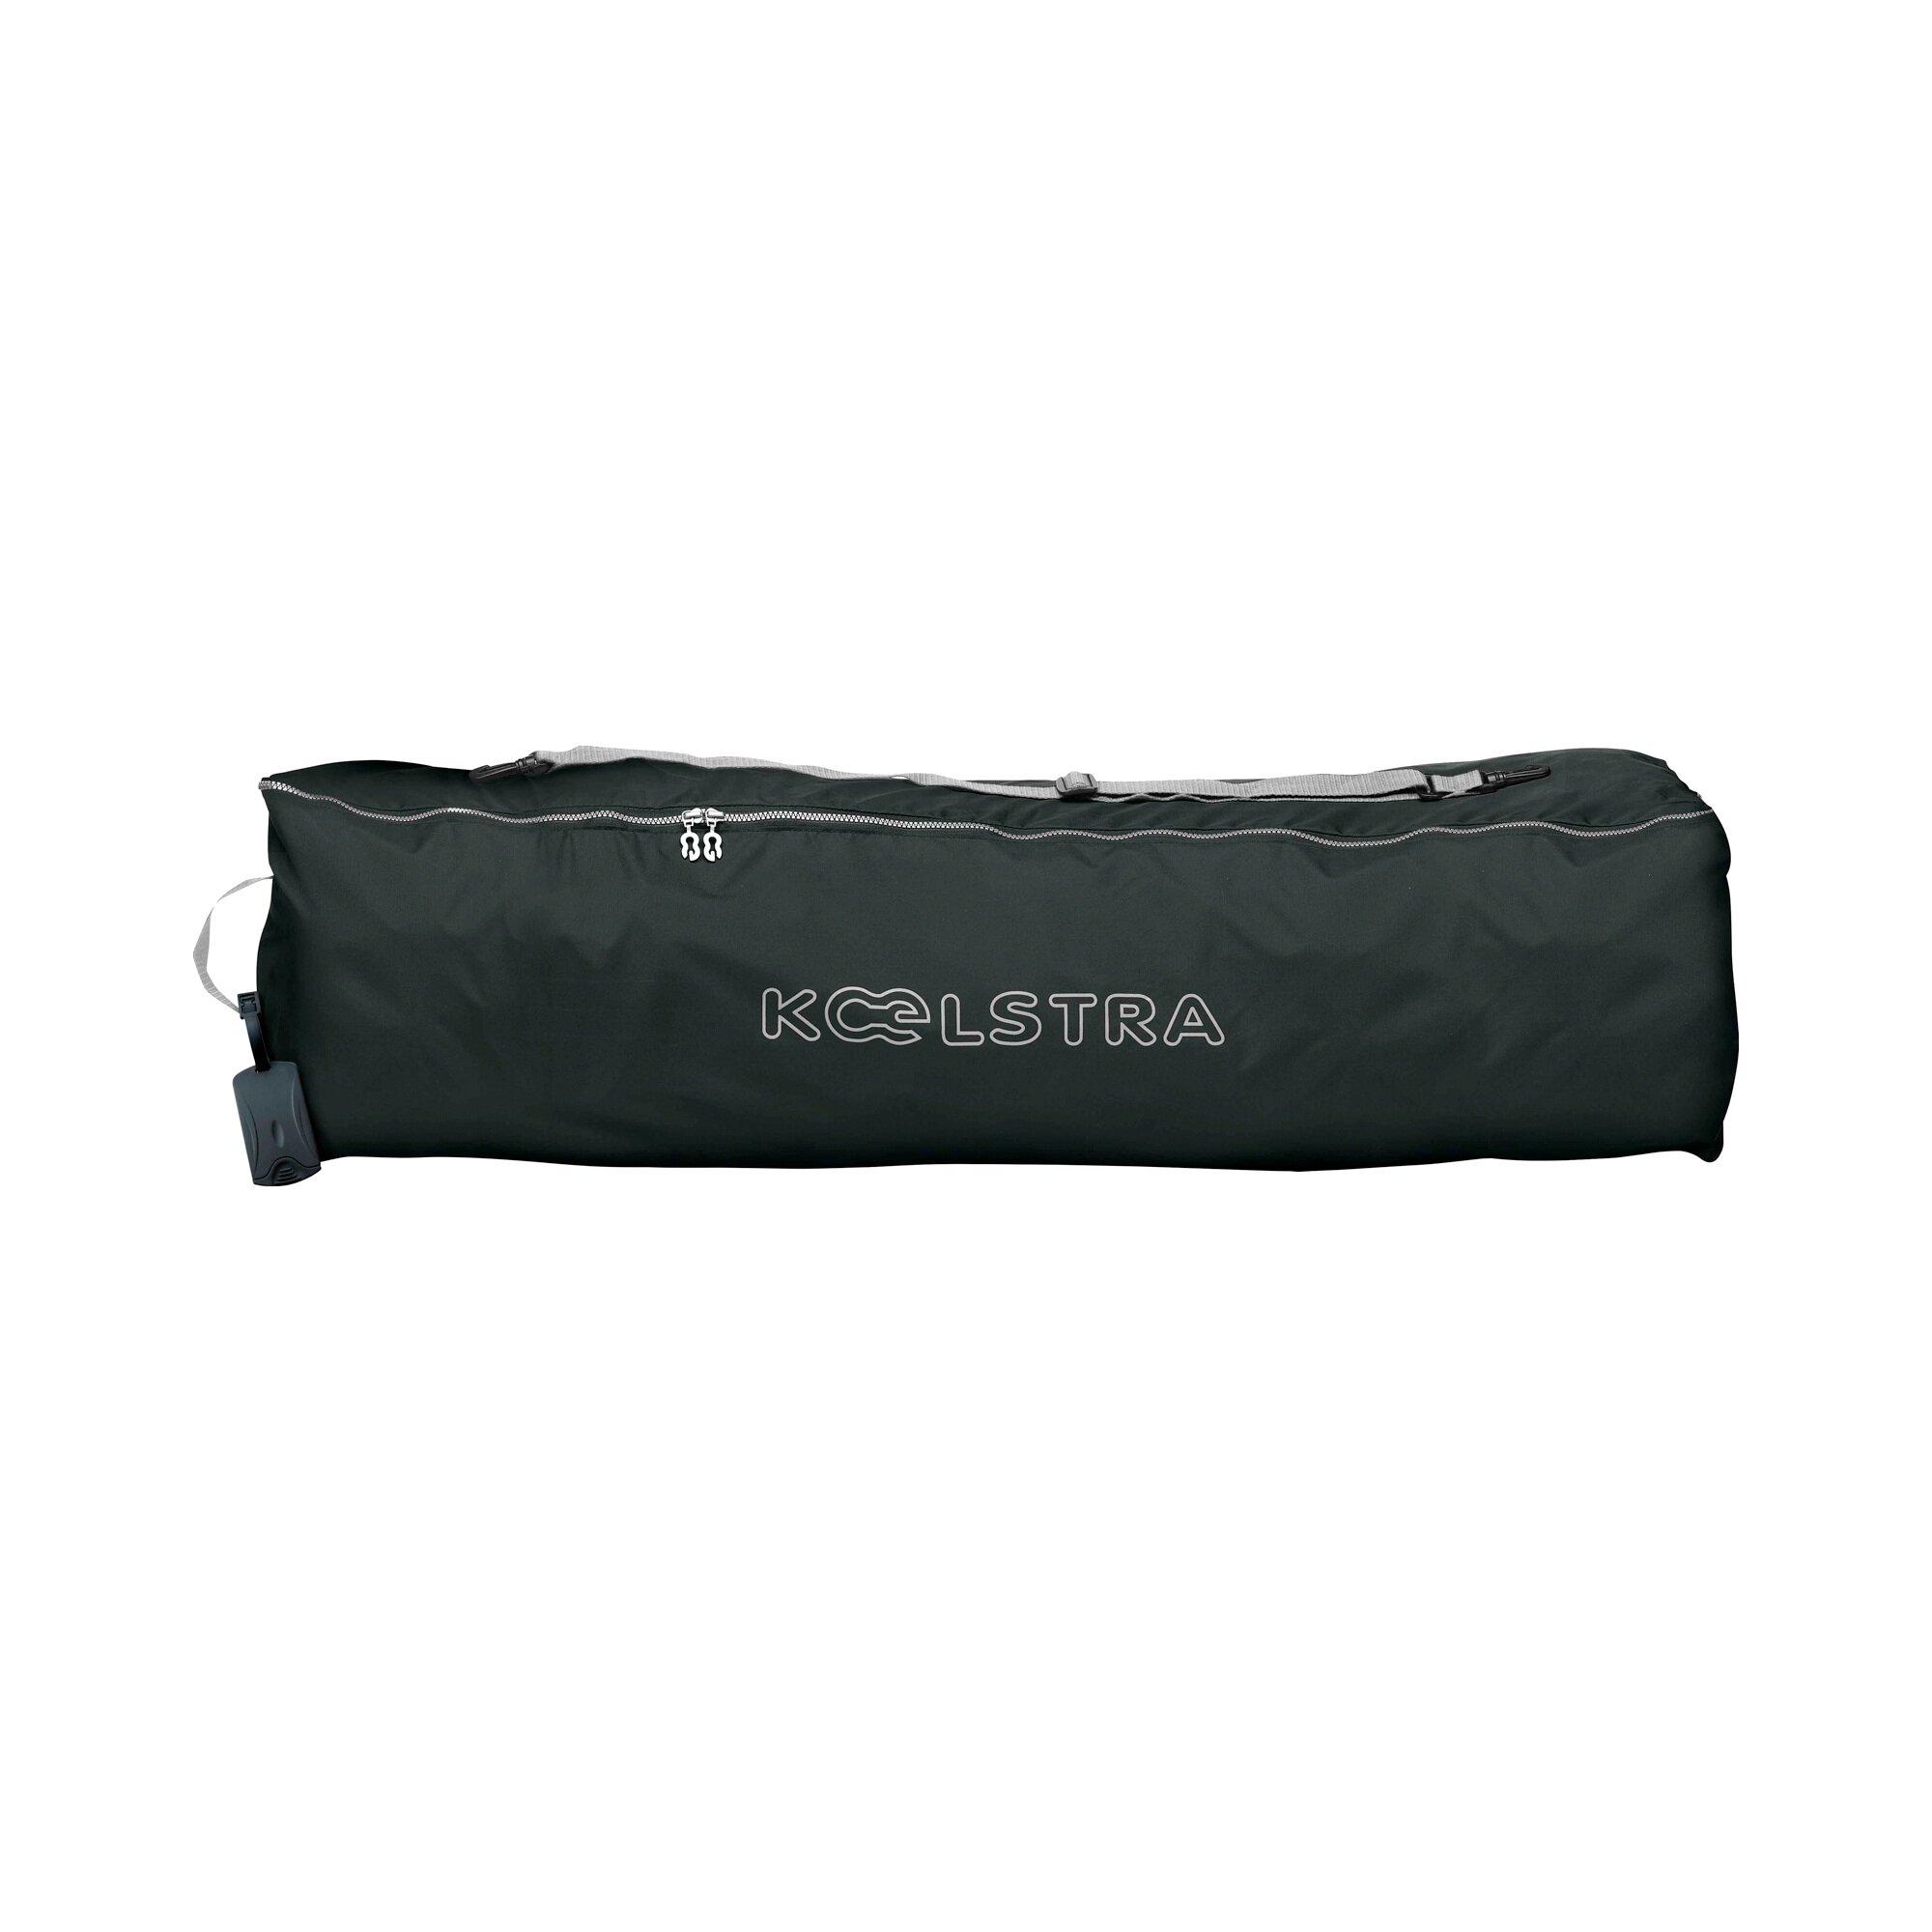 Koelstra Travelbag für Simba T4 schwarz